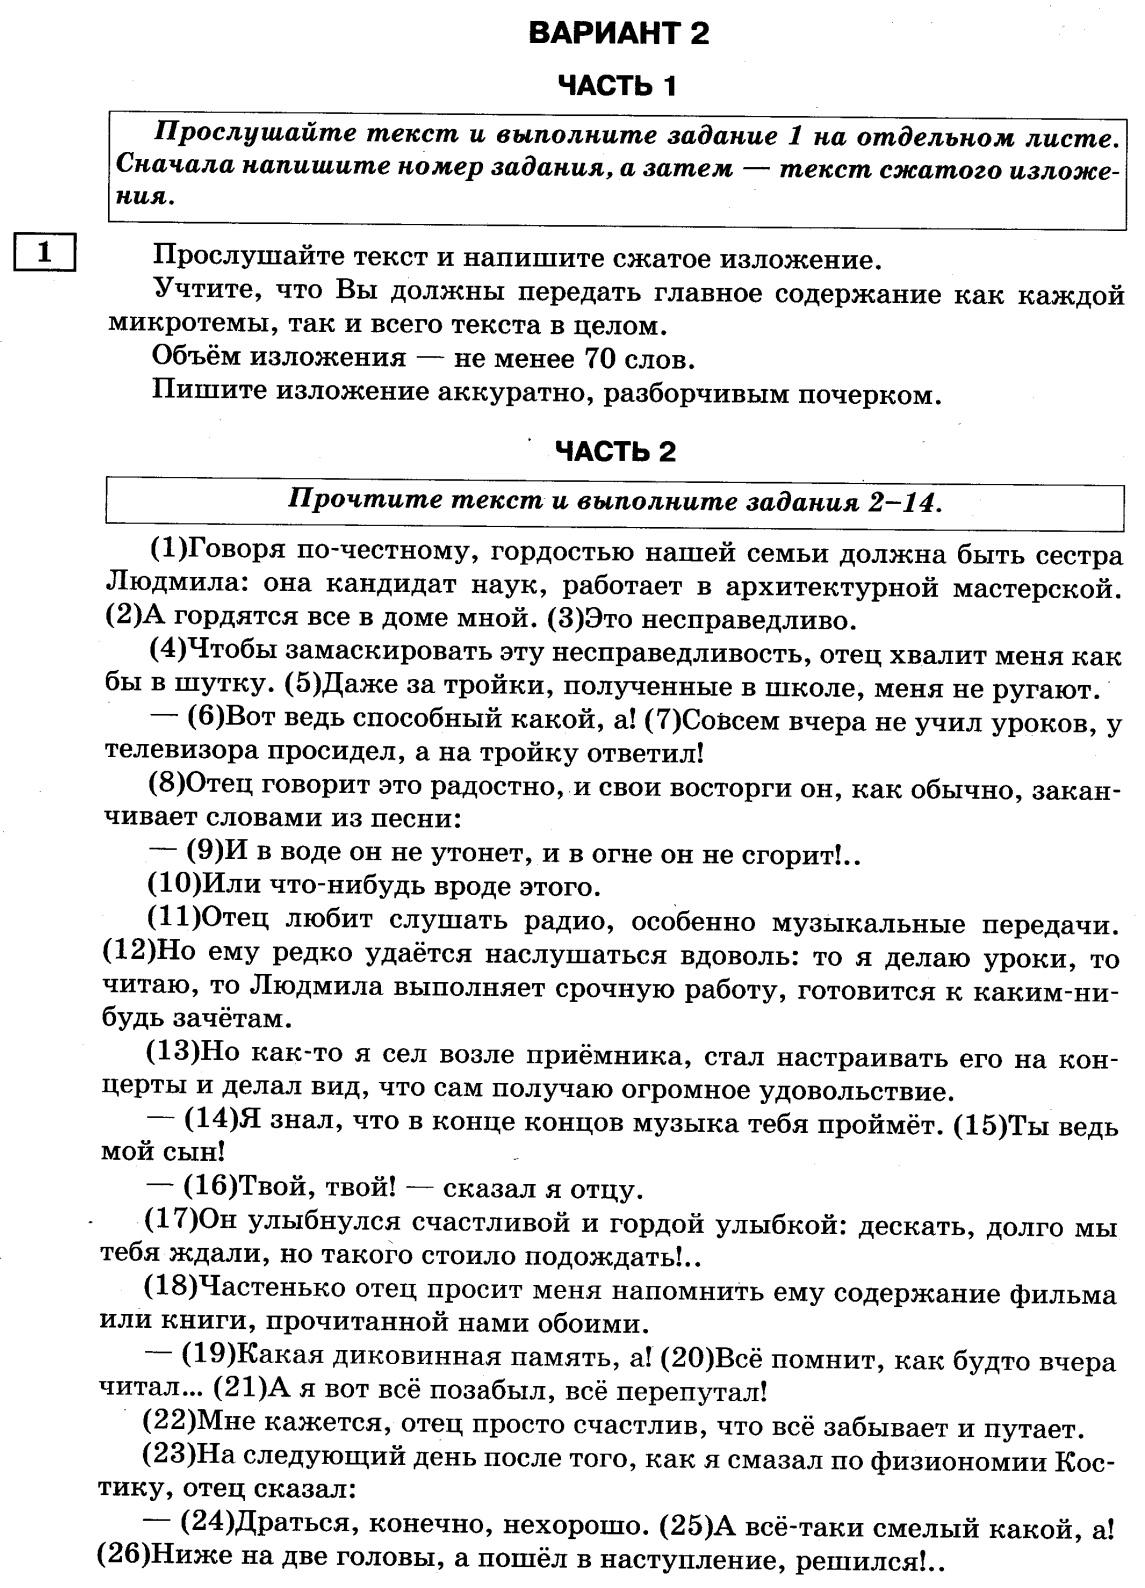 C:\Documents and Settings\Наташа\Рабочий стол\ОГЭ 2016\КИМы Степановой ОГЭ-2016\img289.jpg